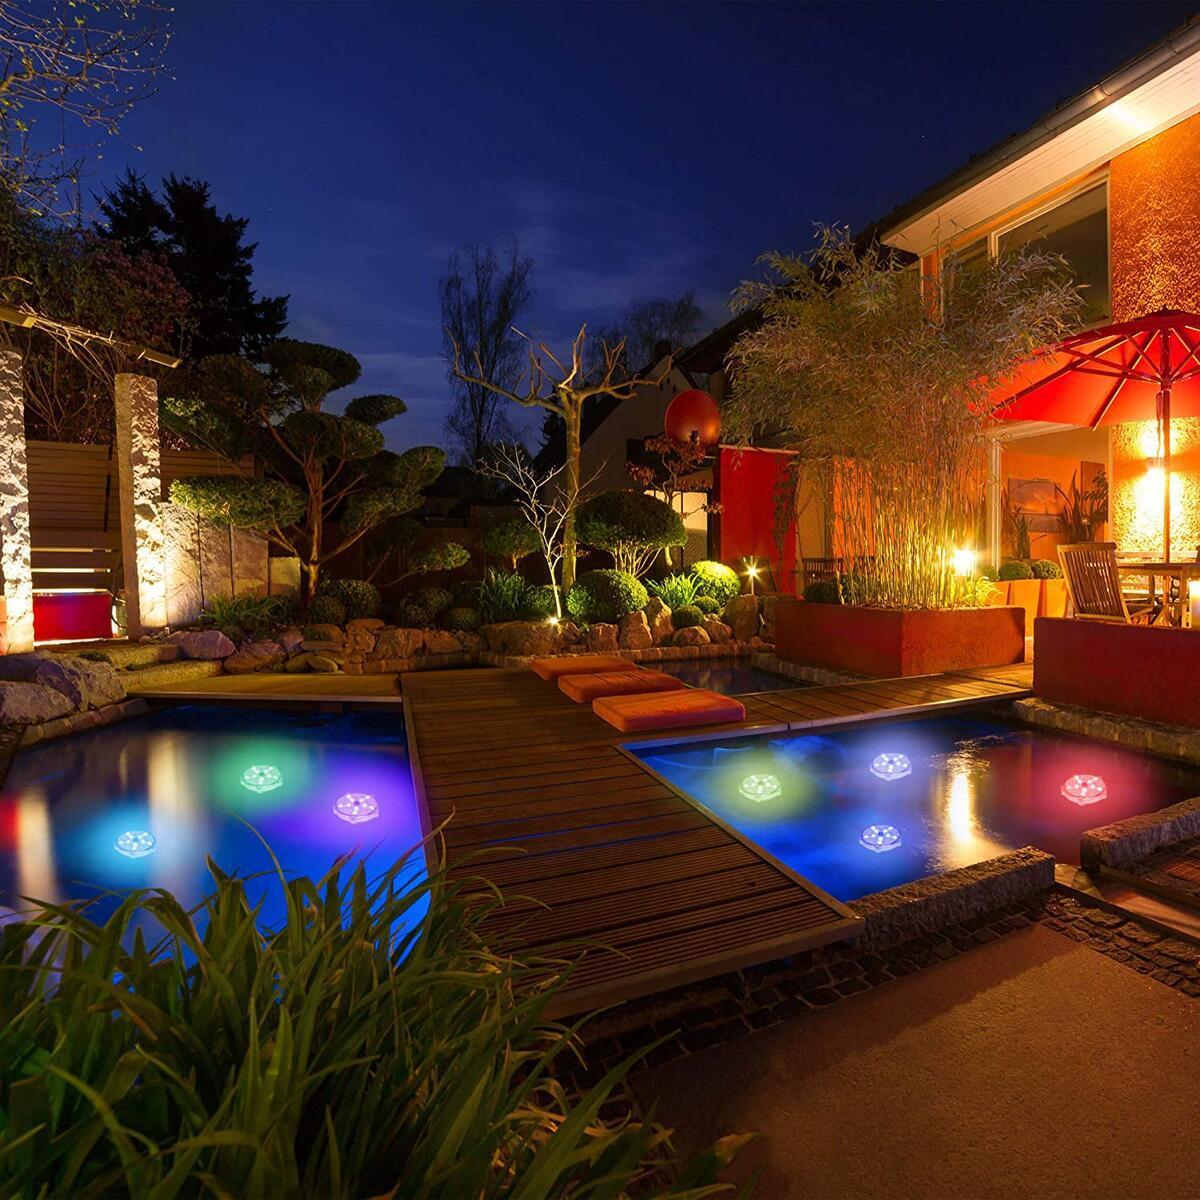 BeautifulLife 2 Pack Starfish Floating Pool Lights